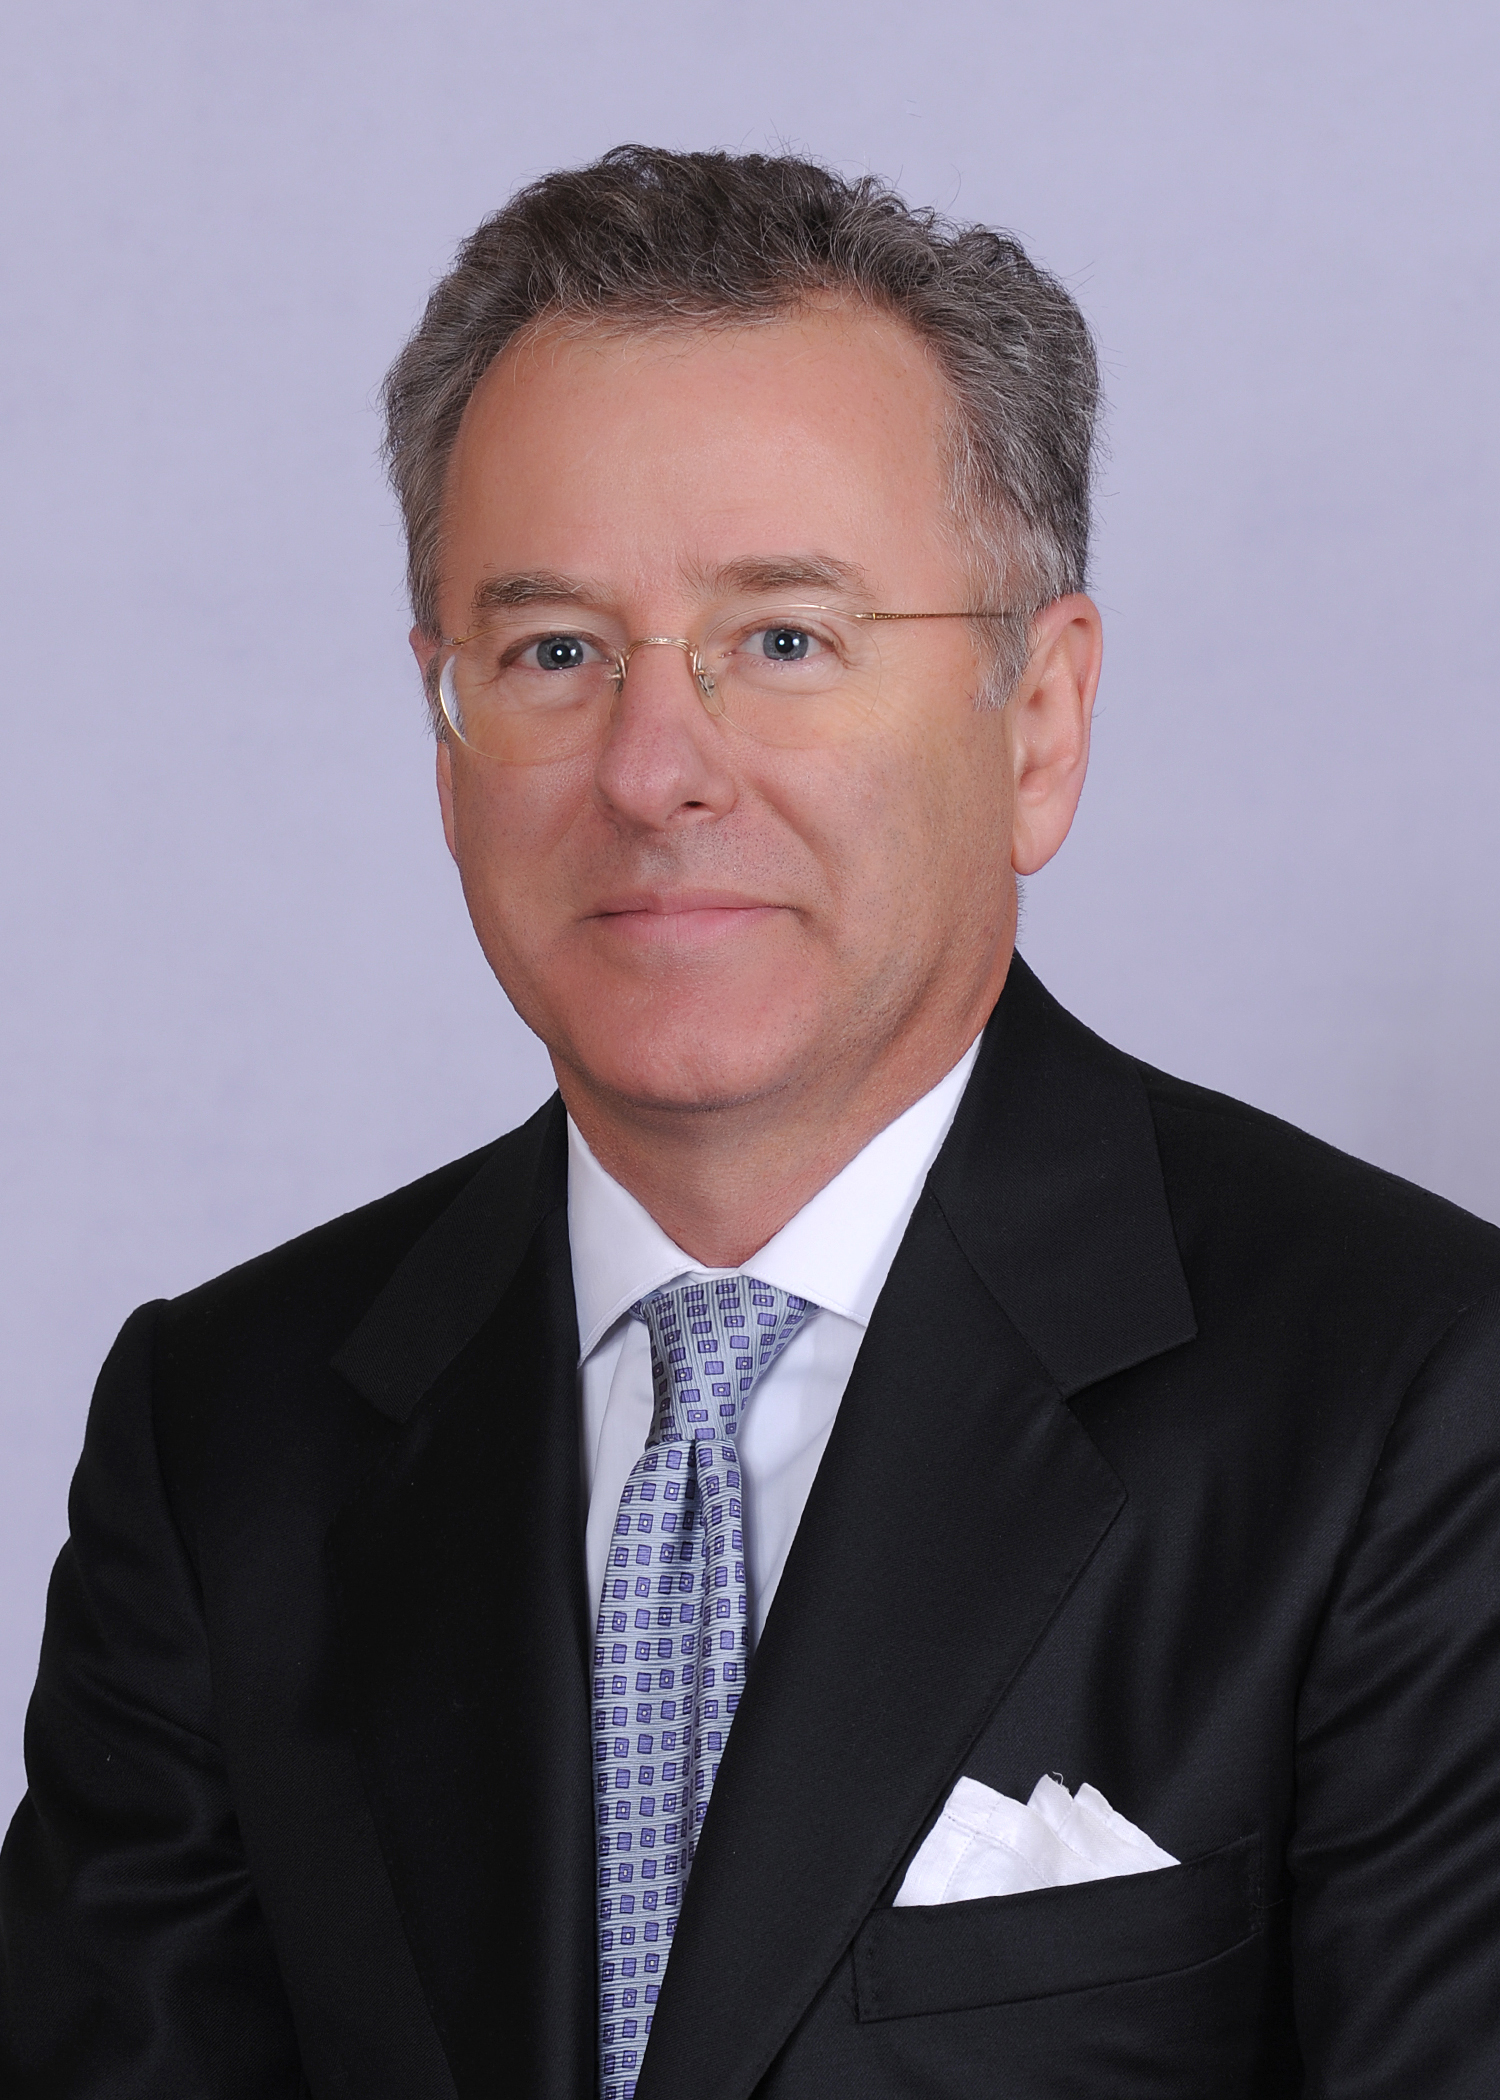 Frederic Wittmann